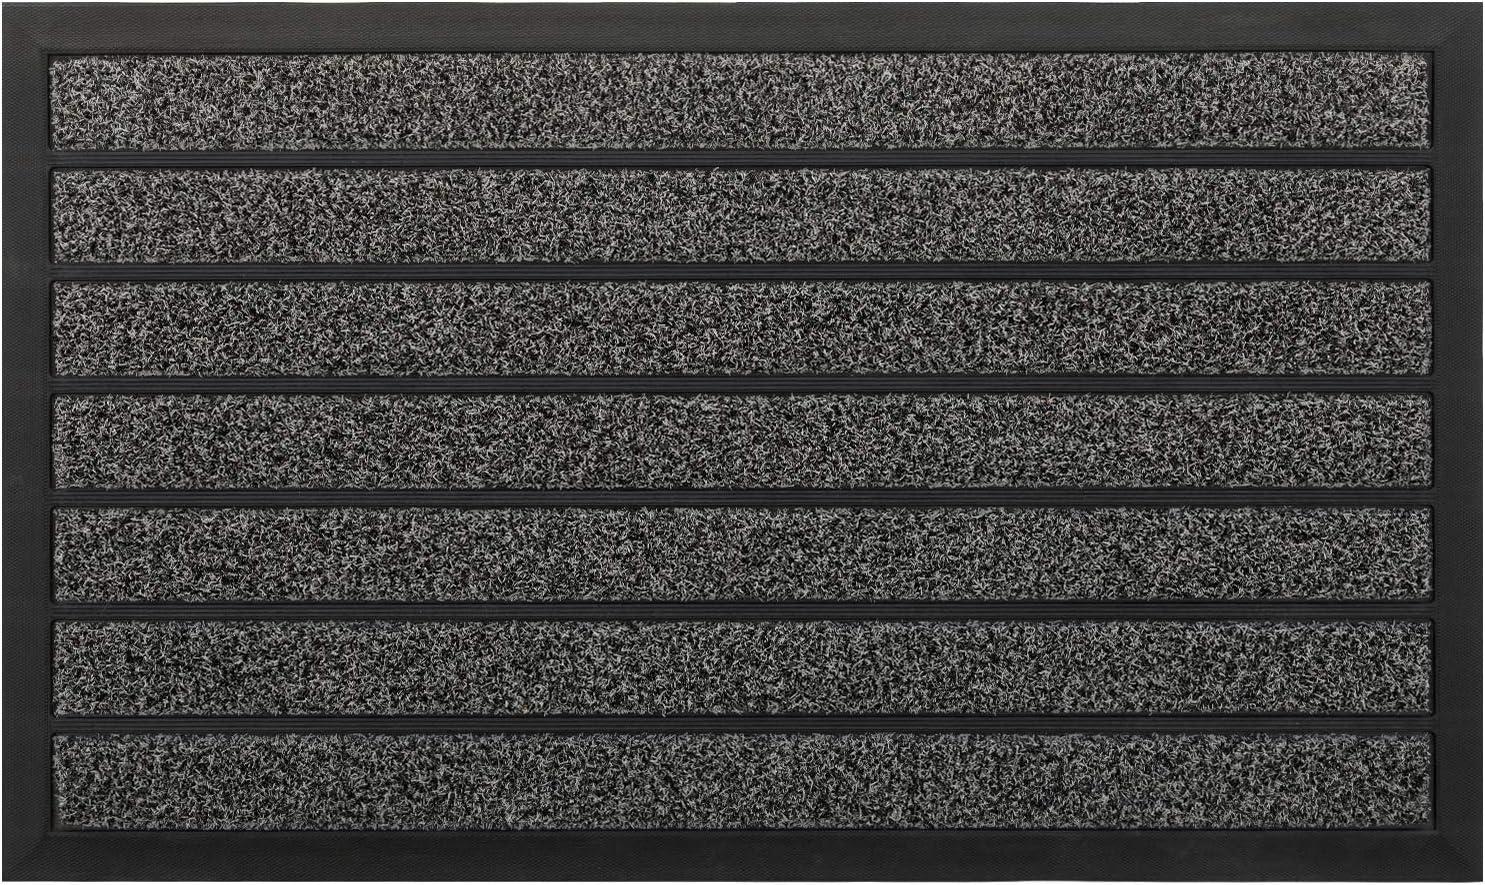 Rubber Door Mat, Front Outdoor Doormat by PILITO, Heavy Duty Welcome Mats, Non-Slip Entrance Mat for Patio, Entry, Back Door, Capture Dirt & Easy-to-Clean (18